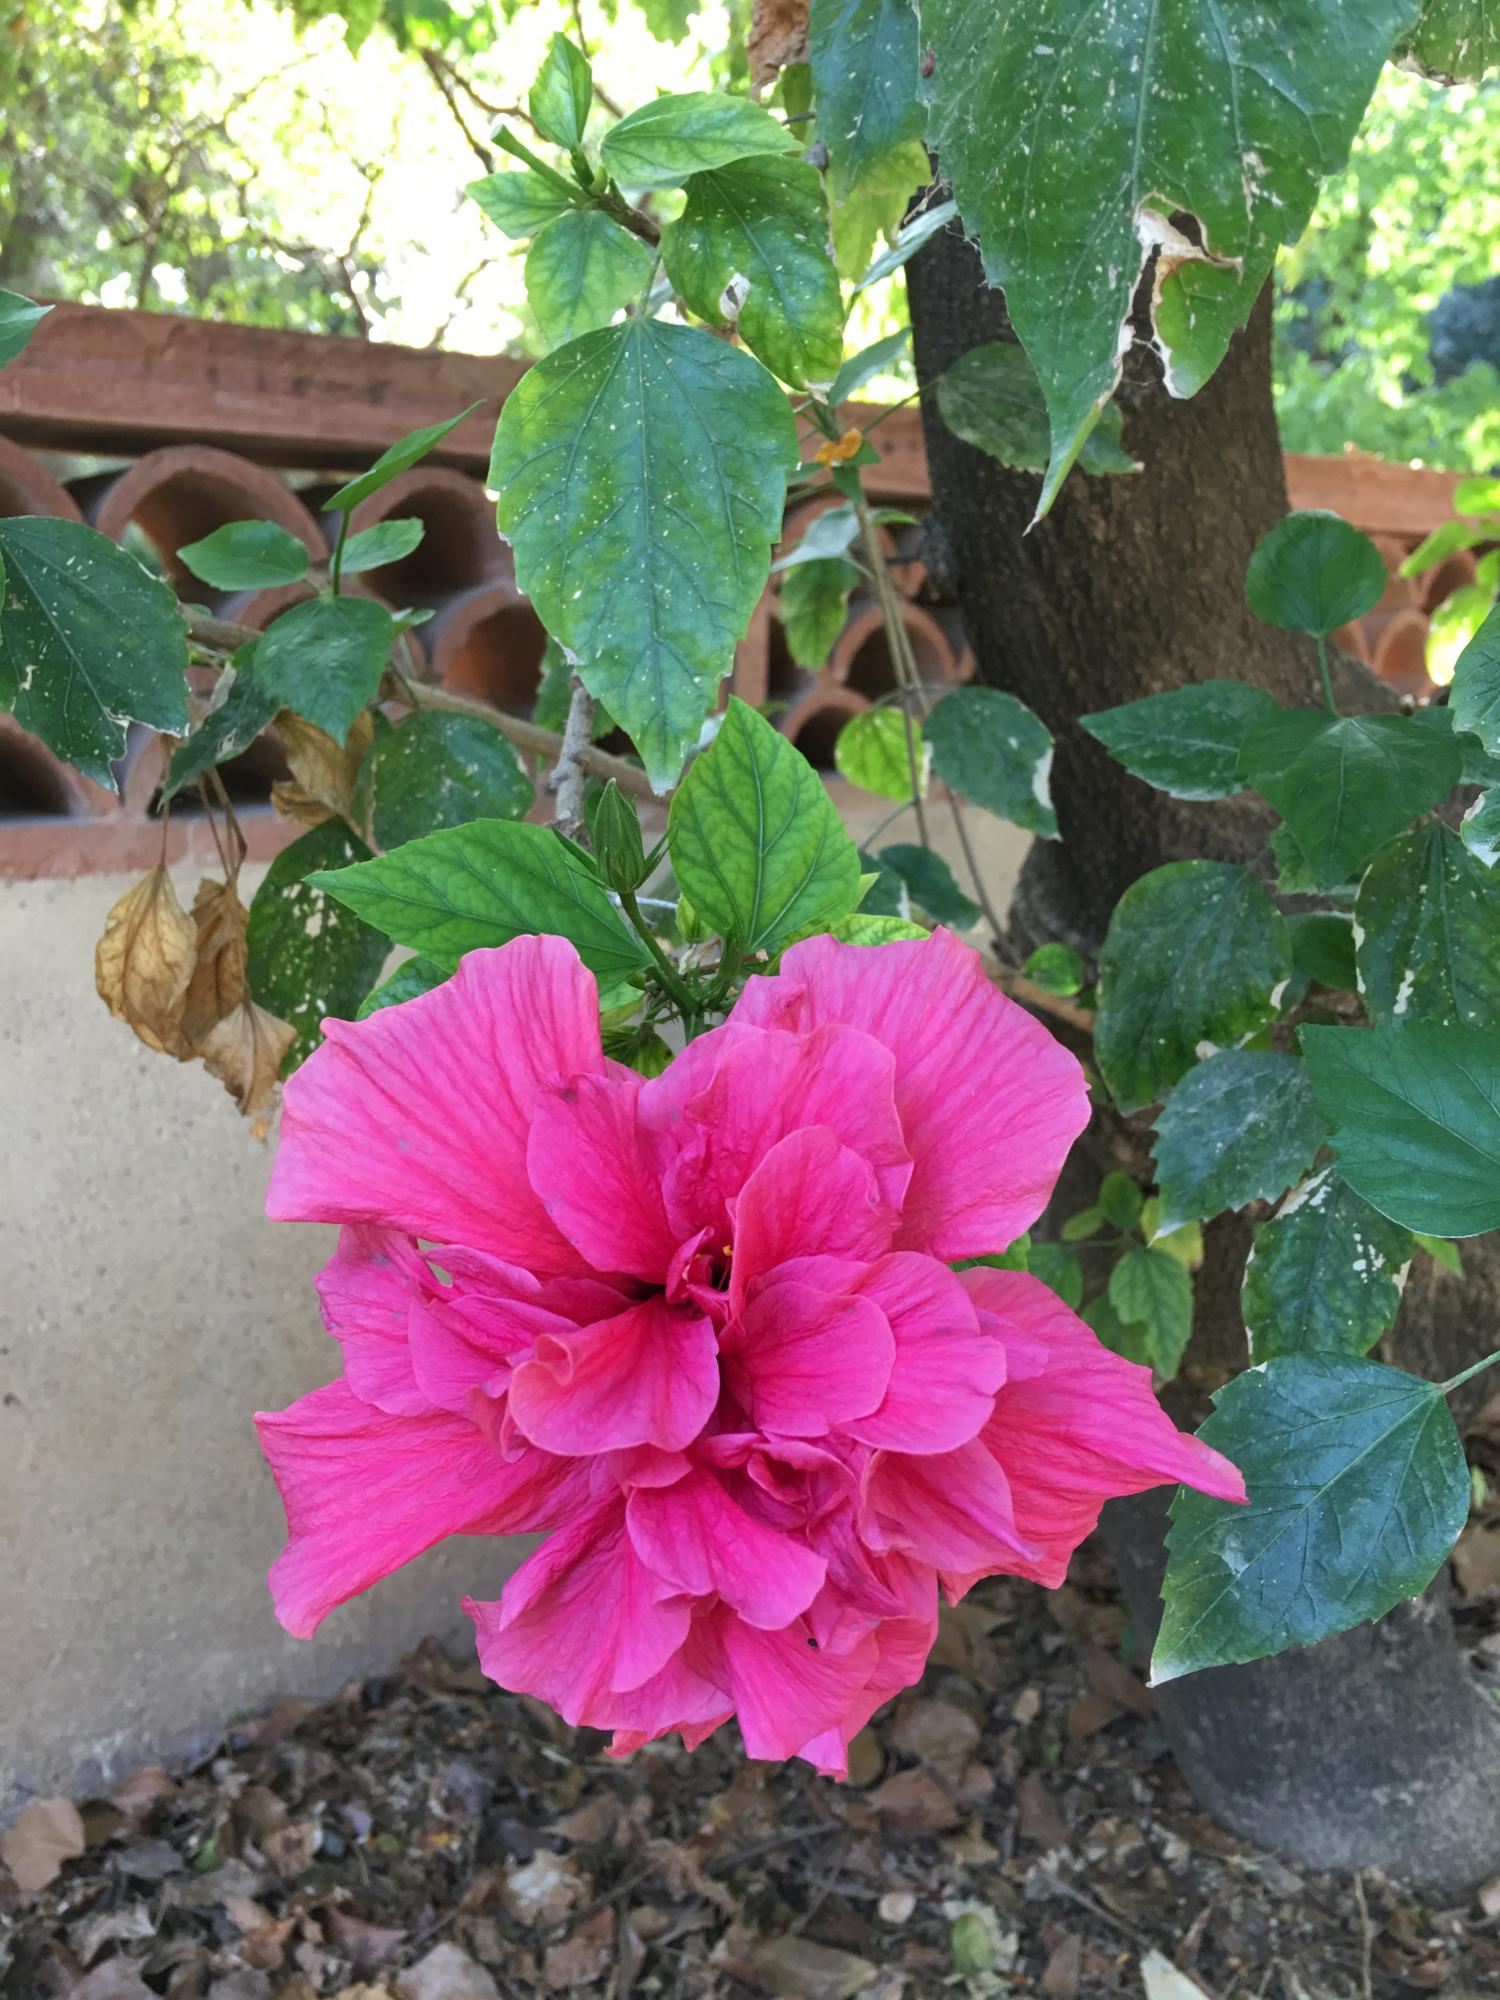 rocaille-blog-palermo-orto-botanico-botanical-garden-17